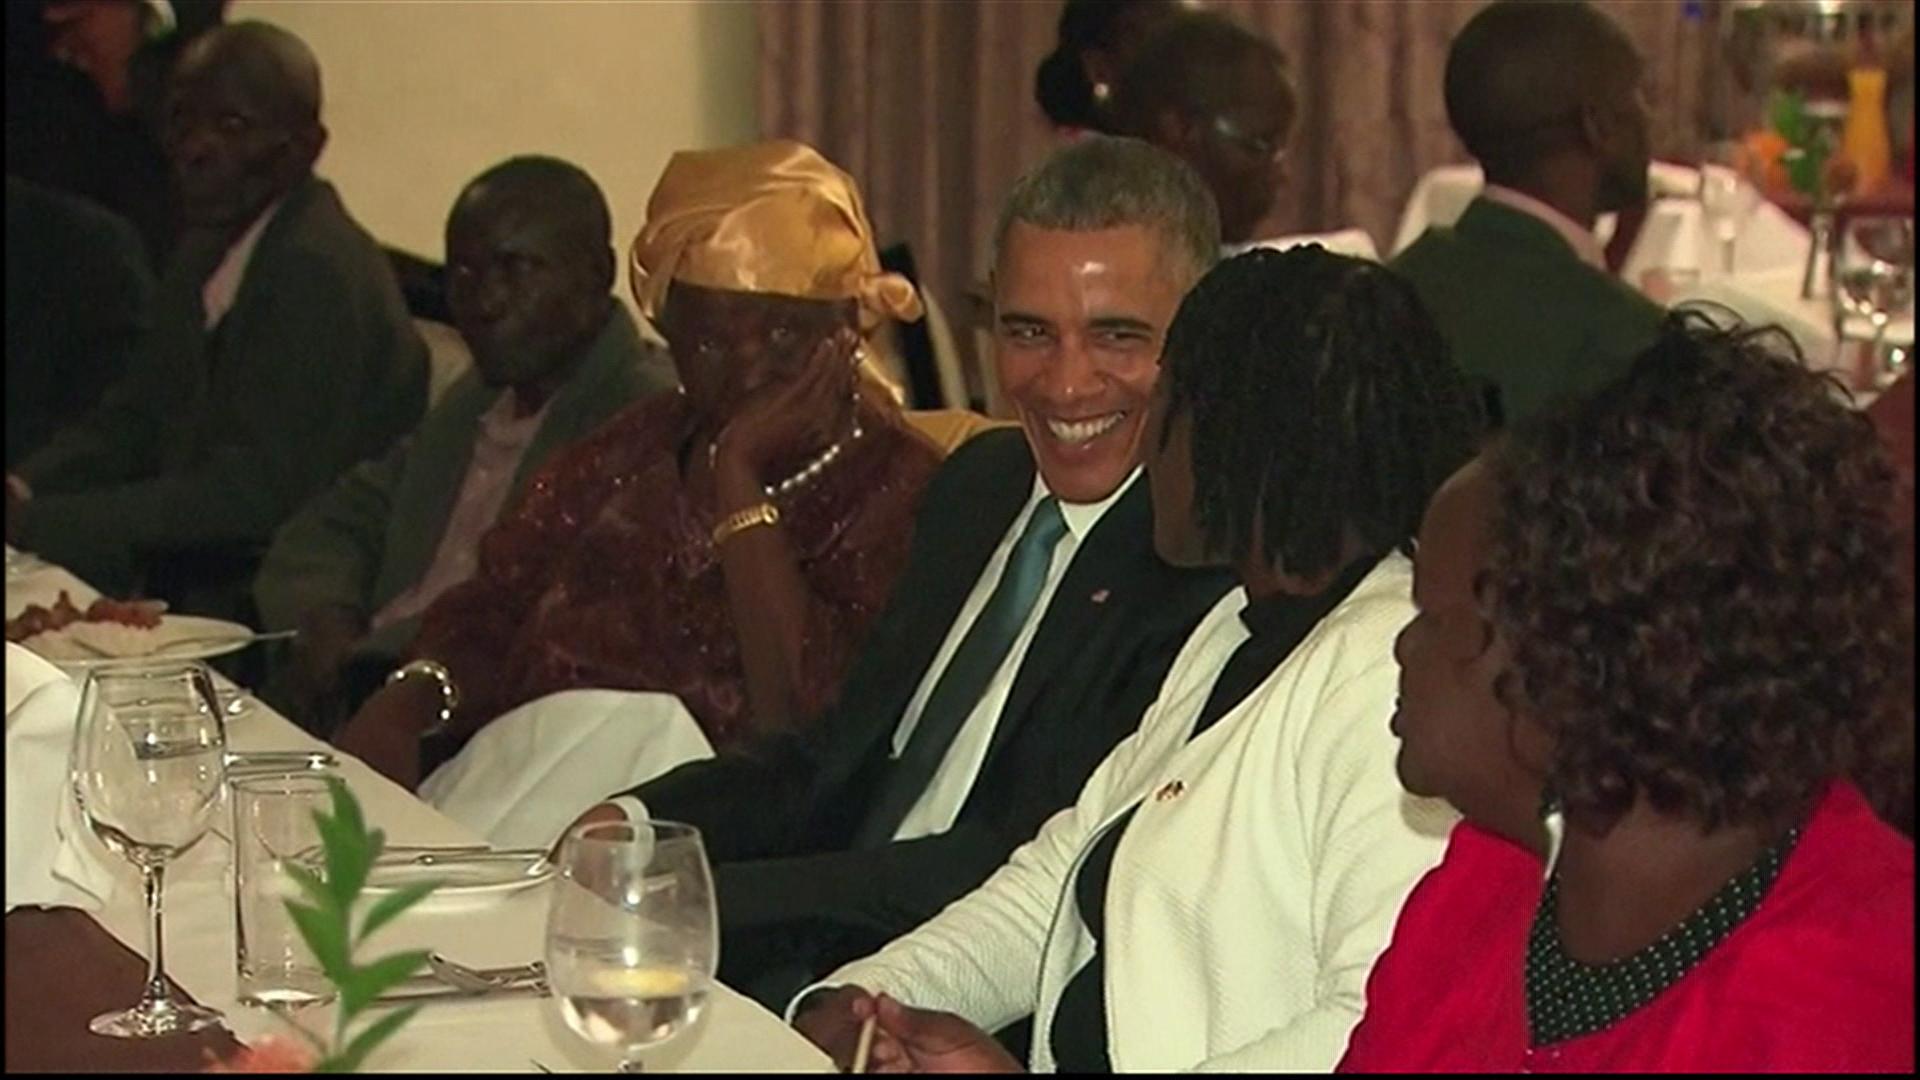 President Obama kicks off Africa trip